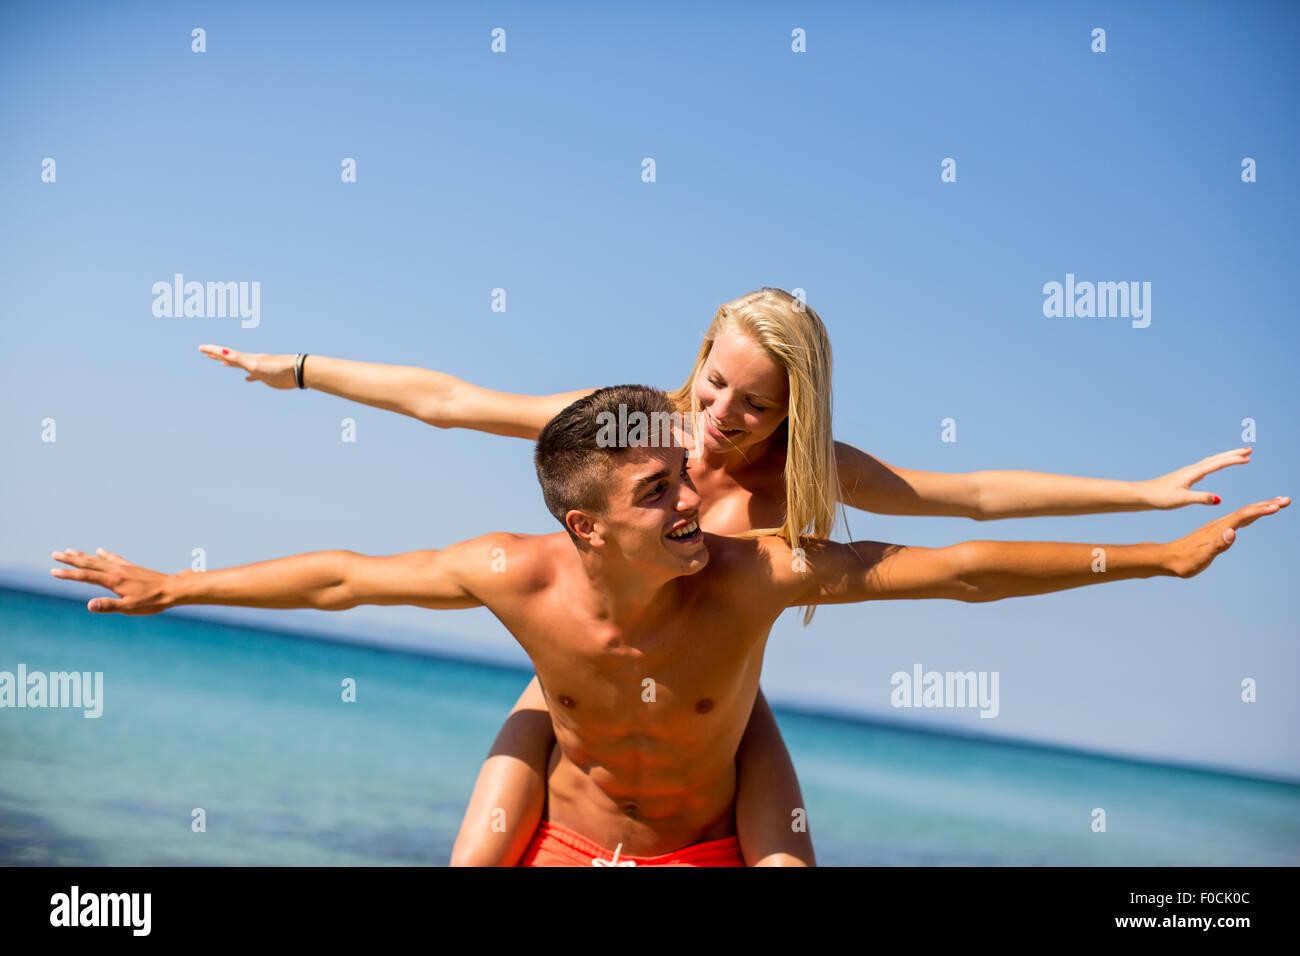 Junges Paar am Strand entspannen Stockbild